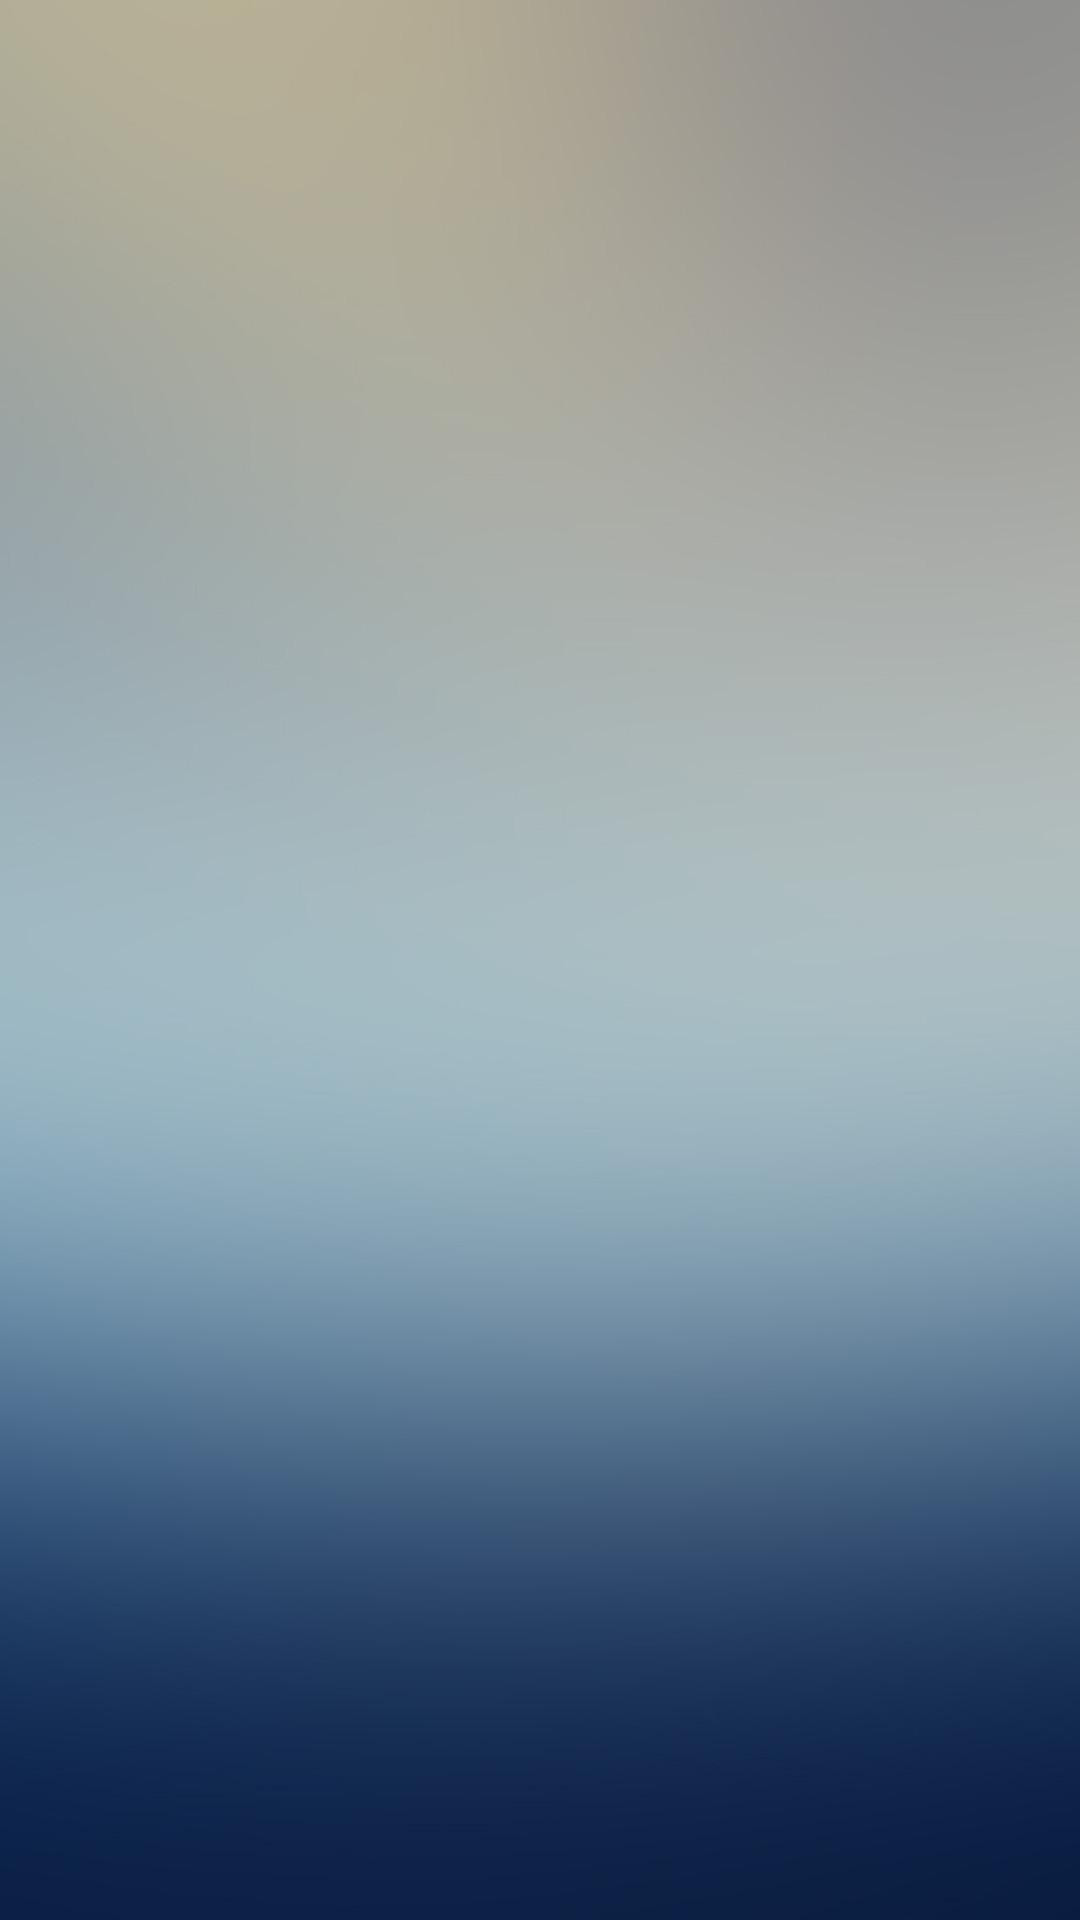 IOS 6 Wallpaper IPad (63+ Images